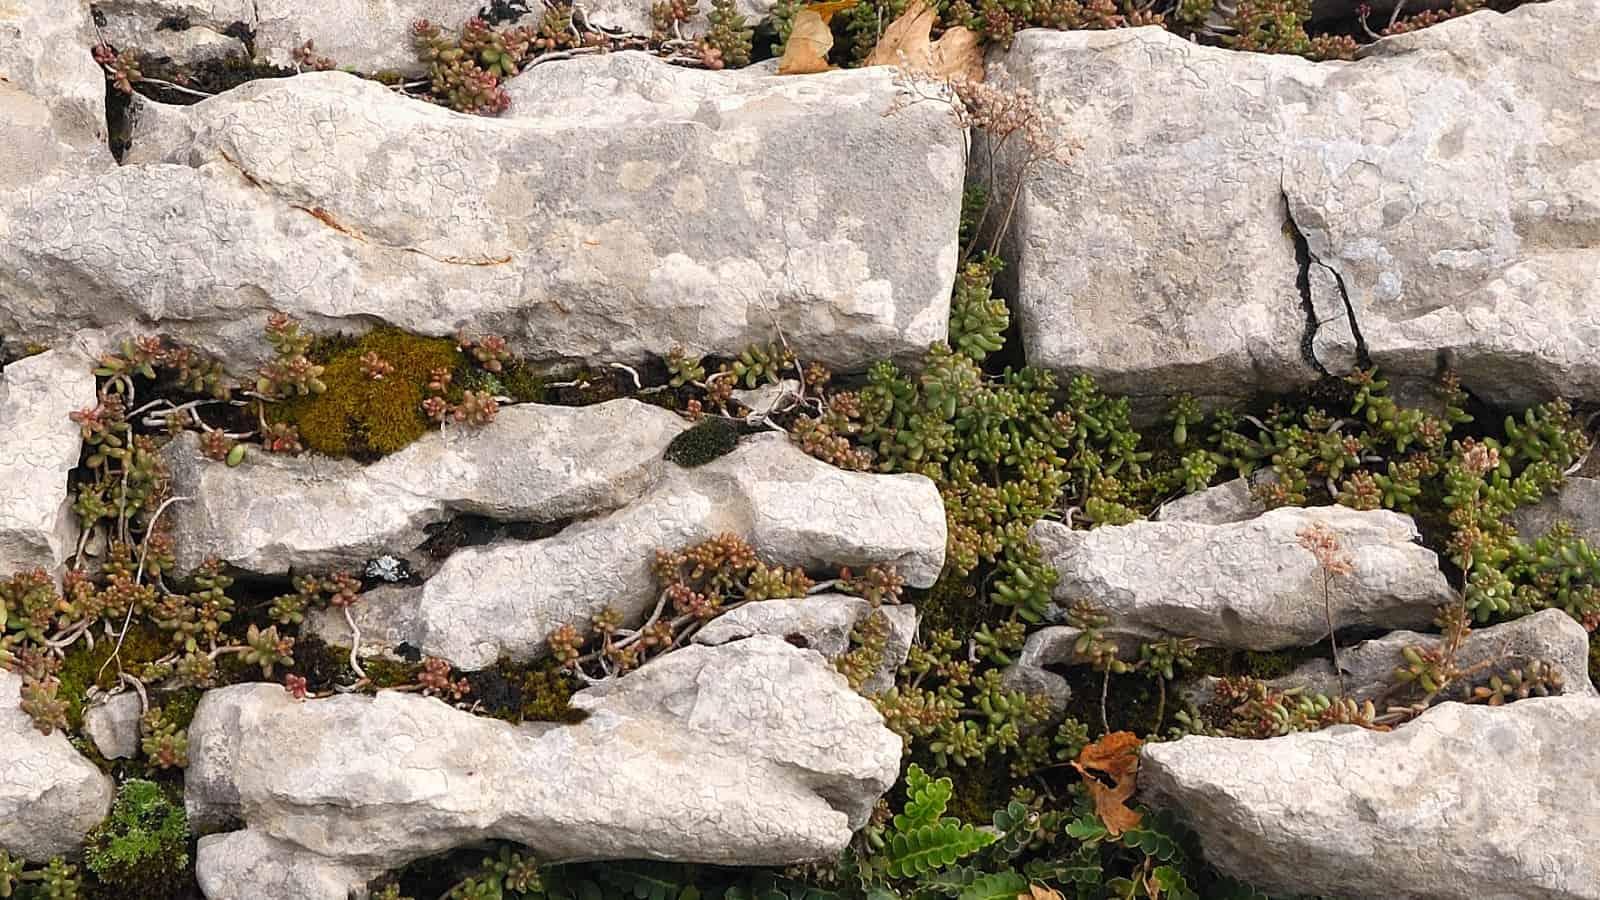 Milzfarn, Schriftfarn, Apothekerfarn (Asplenium ceterach) und weiße Fetthenne (Sedum album) in Kalkstein-Grikes - Foto: Naturpark Vachranski Balkan/Krasimir Lakovski